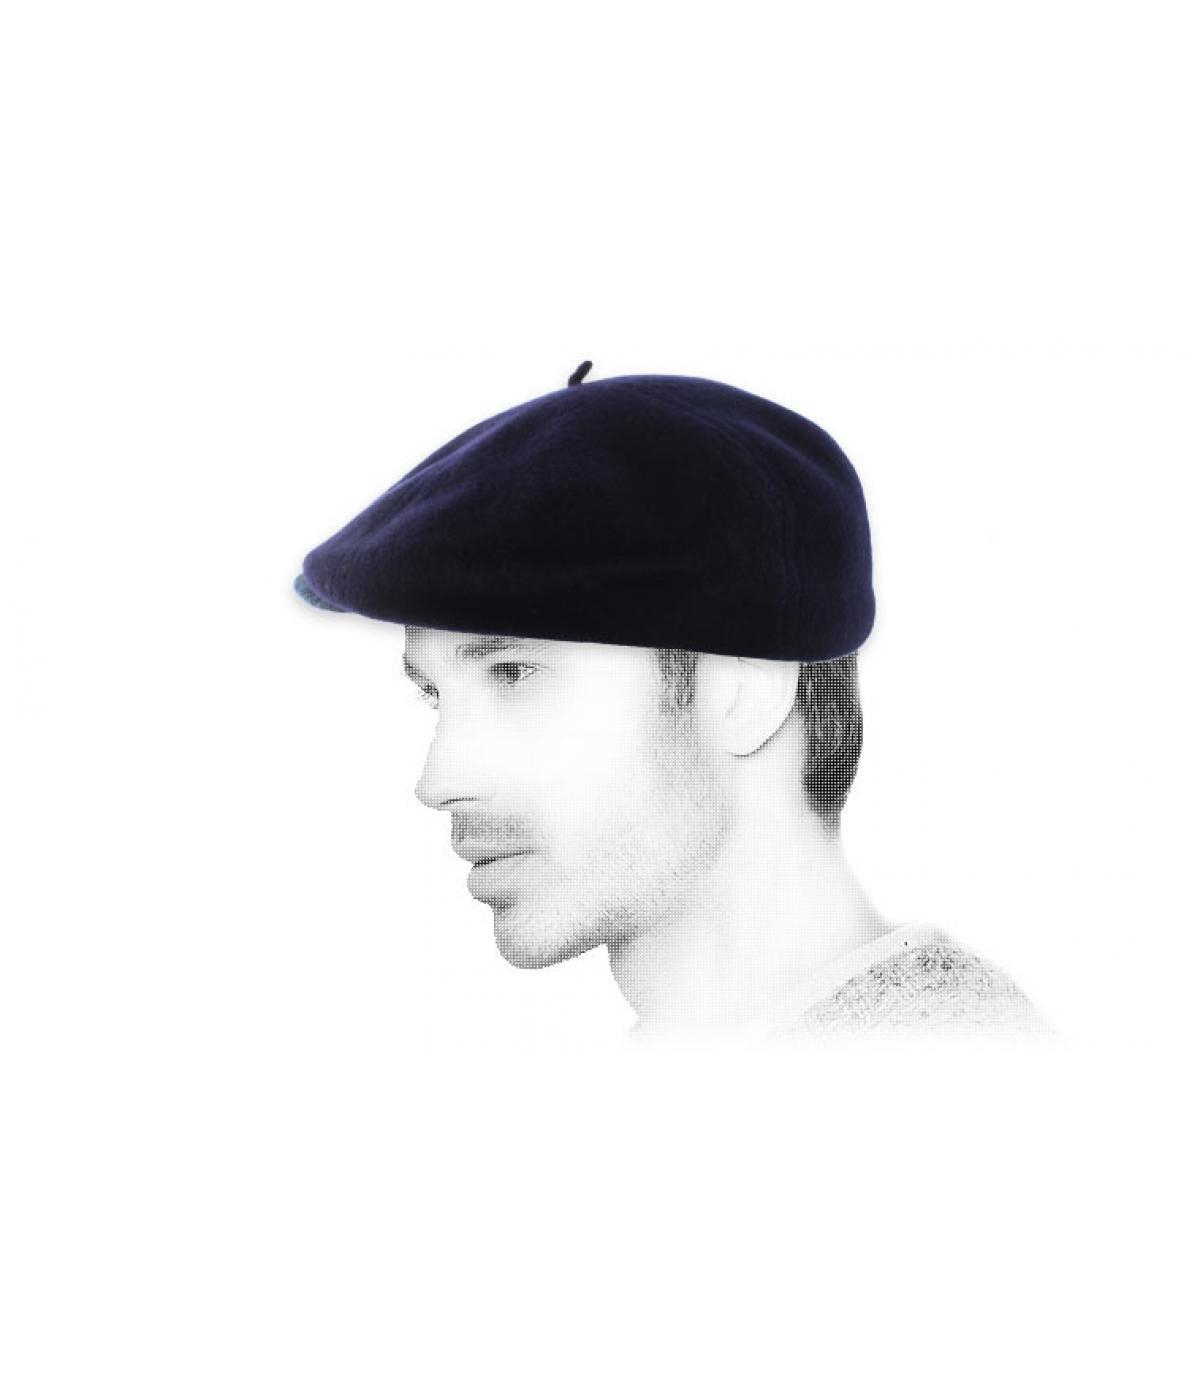 béret casquette marine laine